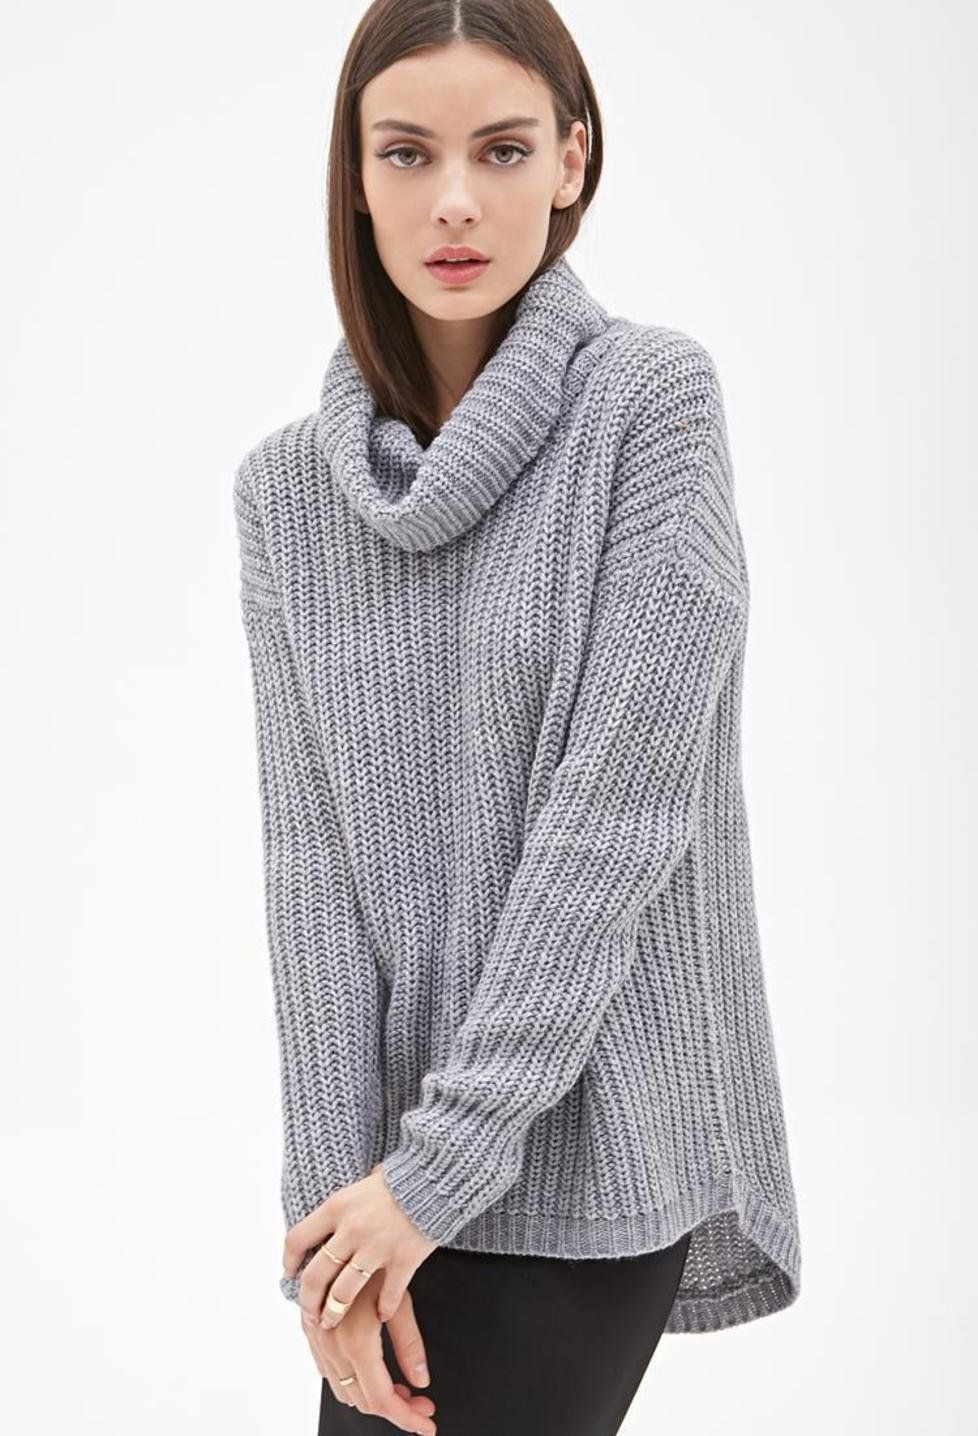 Szary sweter z golfem | Wishlist | Pinterest